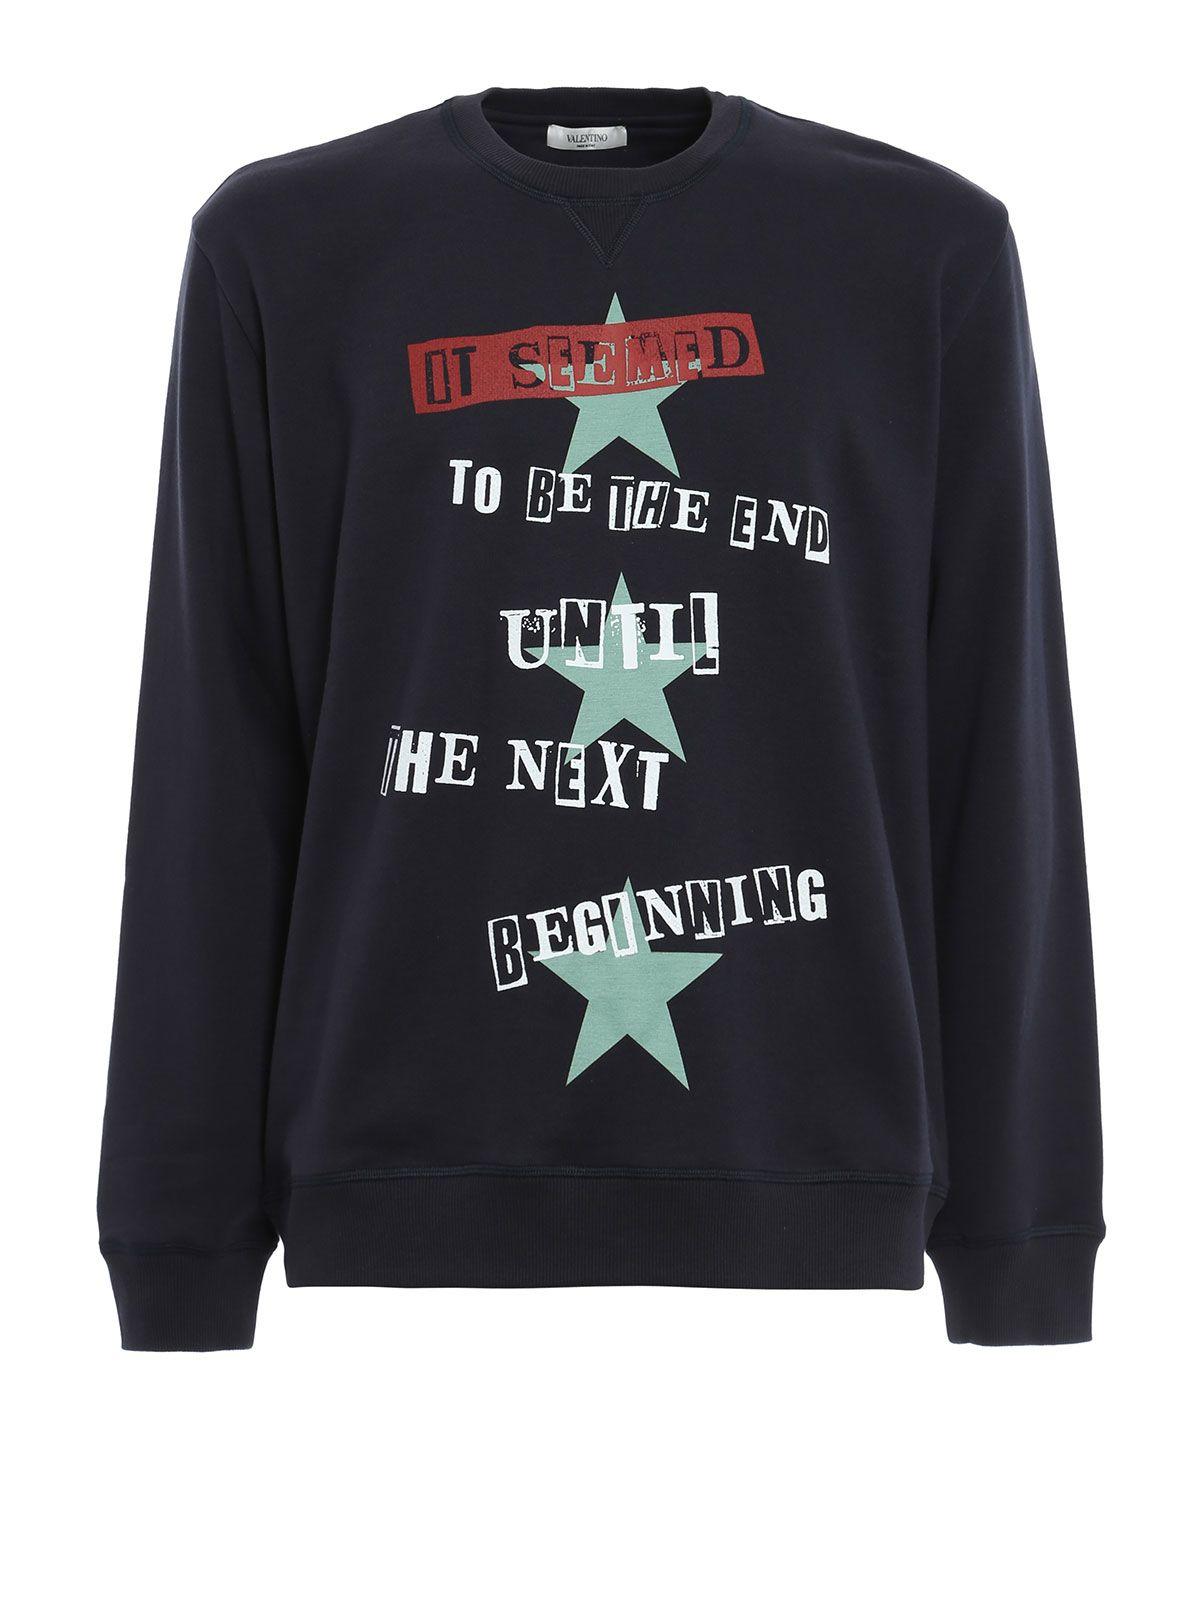 Valentino Jersey Sweatshirt Jamie Reid Prt.